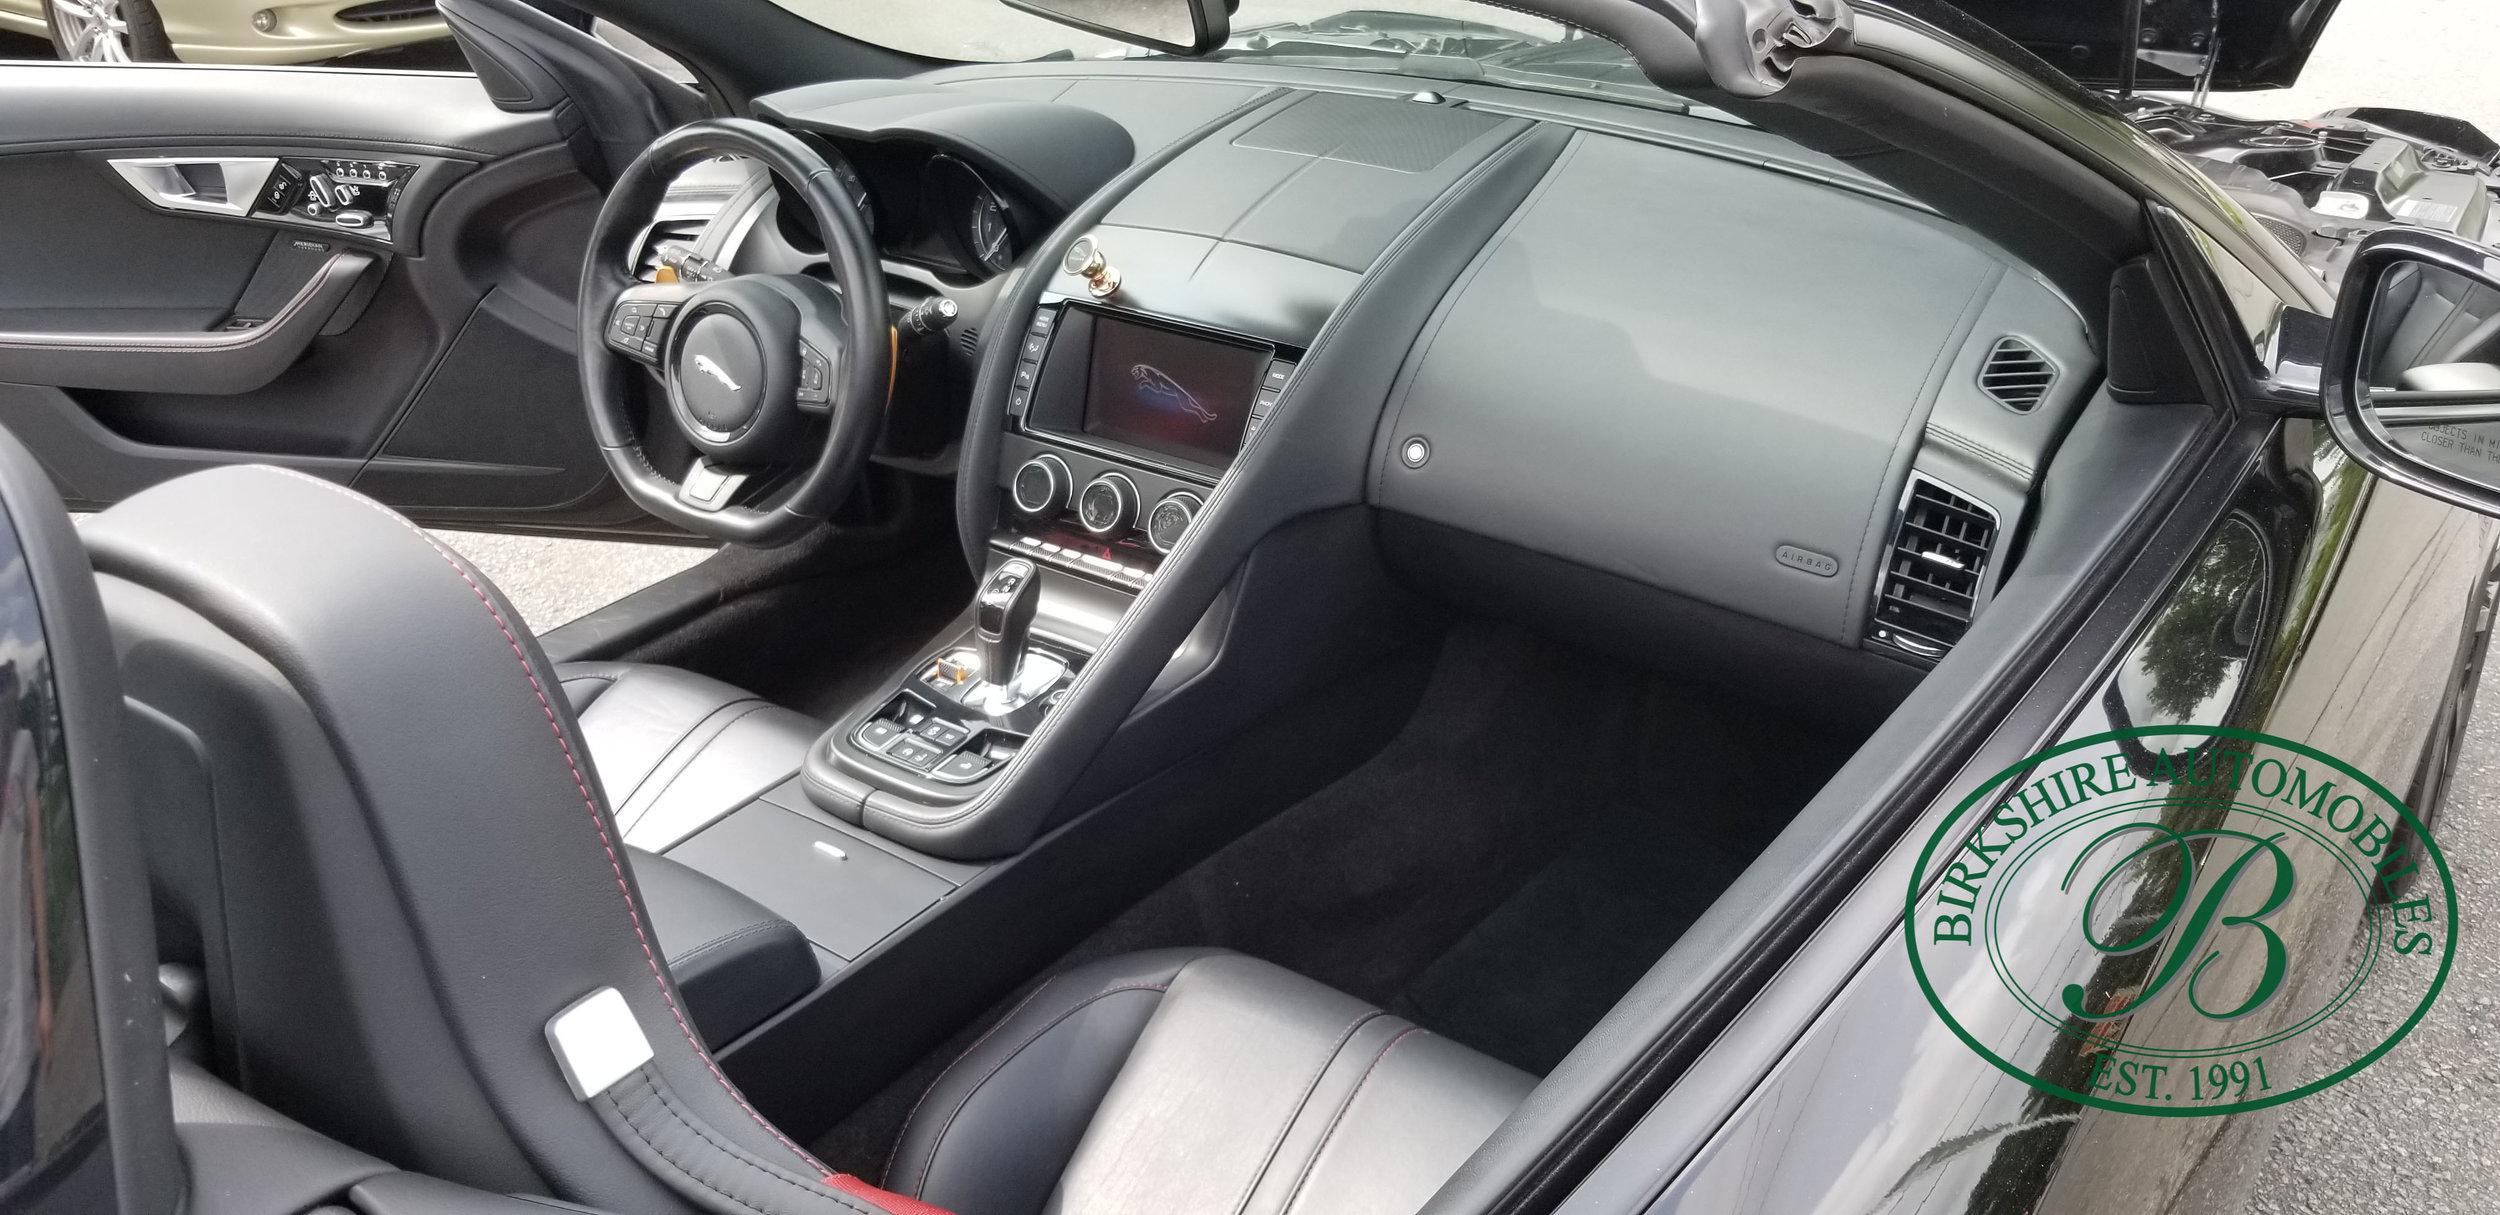 2014 F-Type V8 S - Birkshire Automobiles (17).jpg